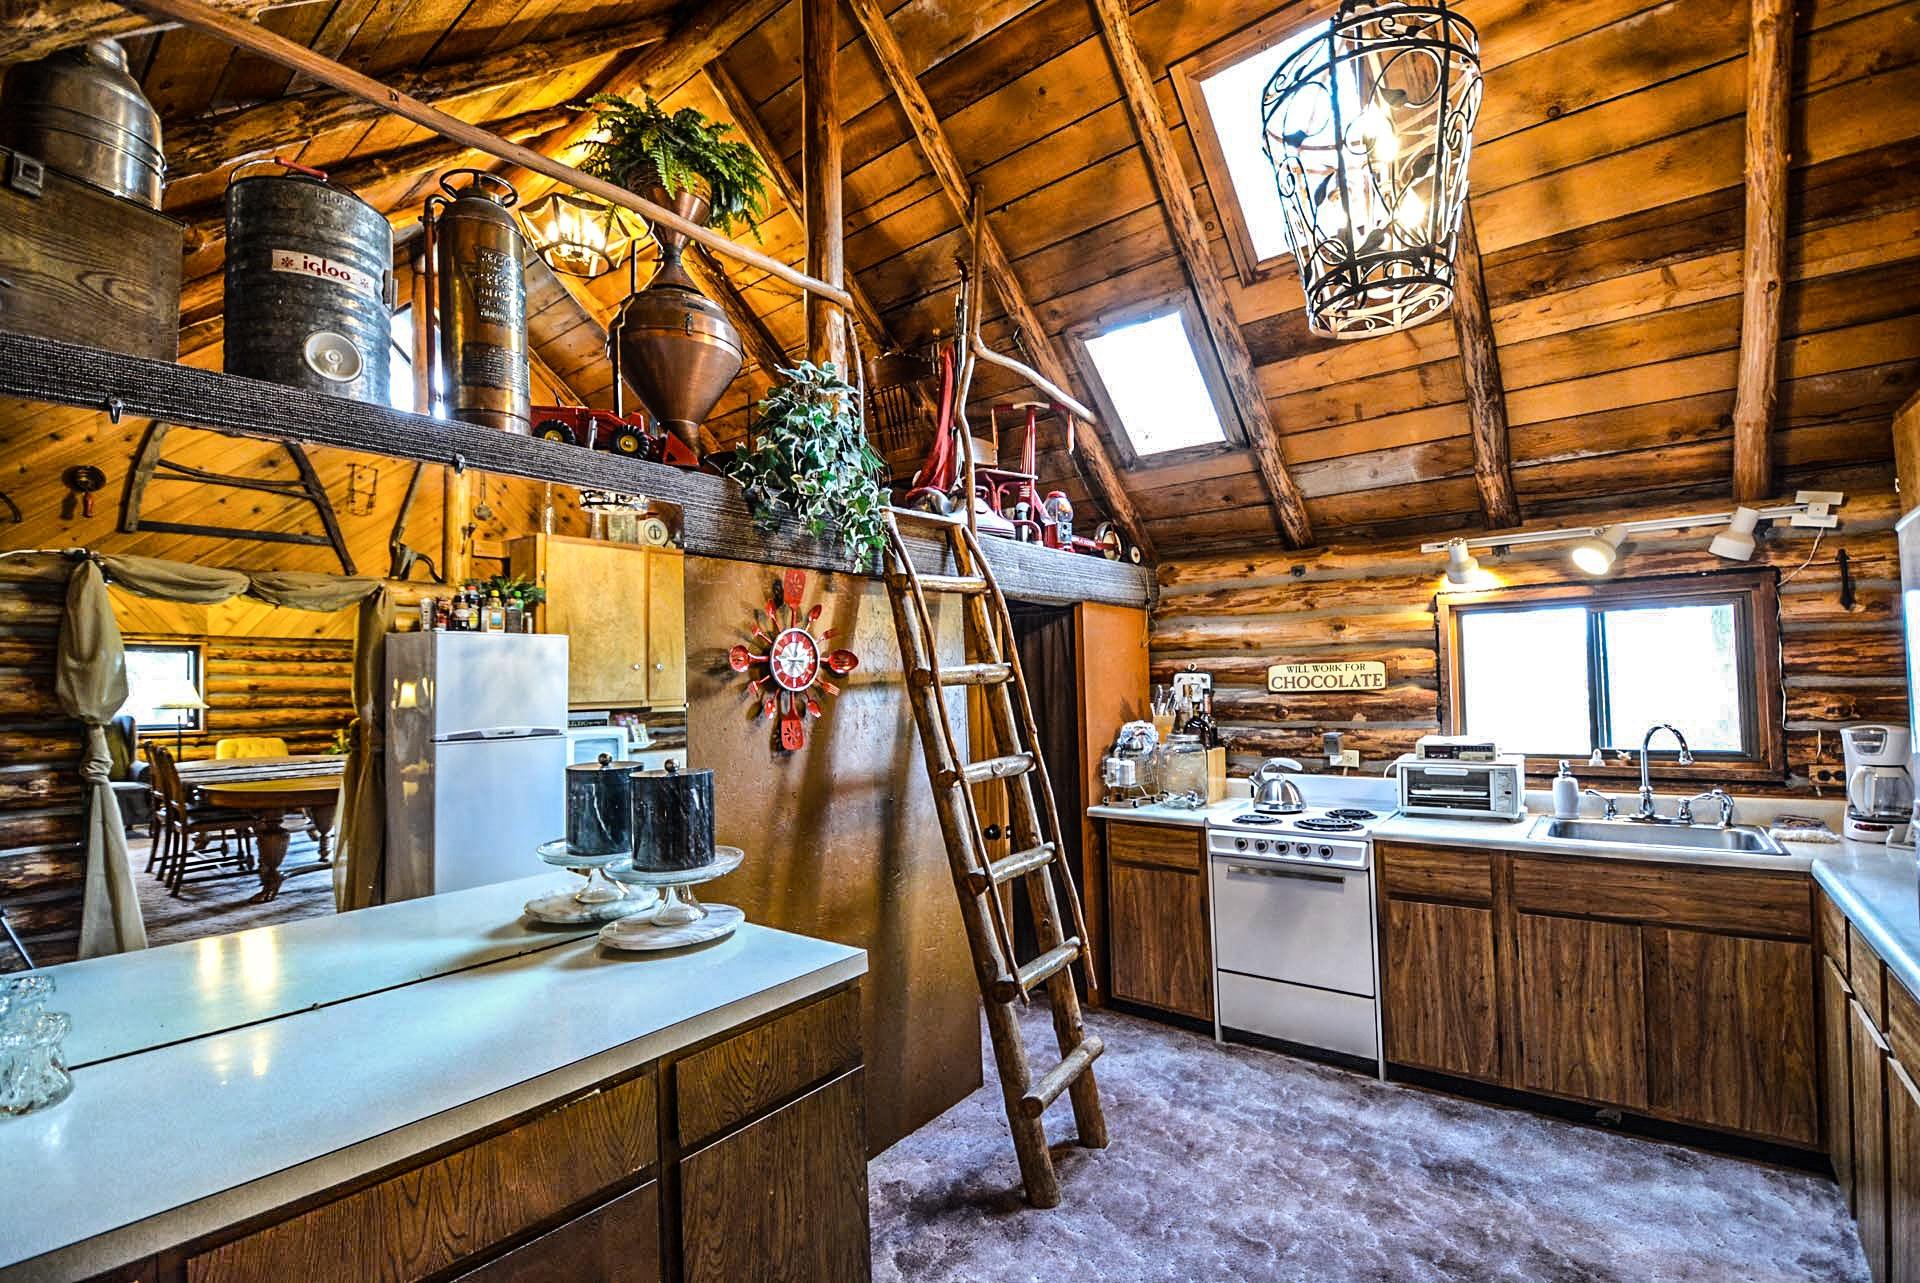 Fotos gratis : interior, restaurante, rústico, rural, Iniciar sesión ...